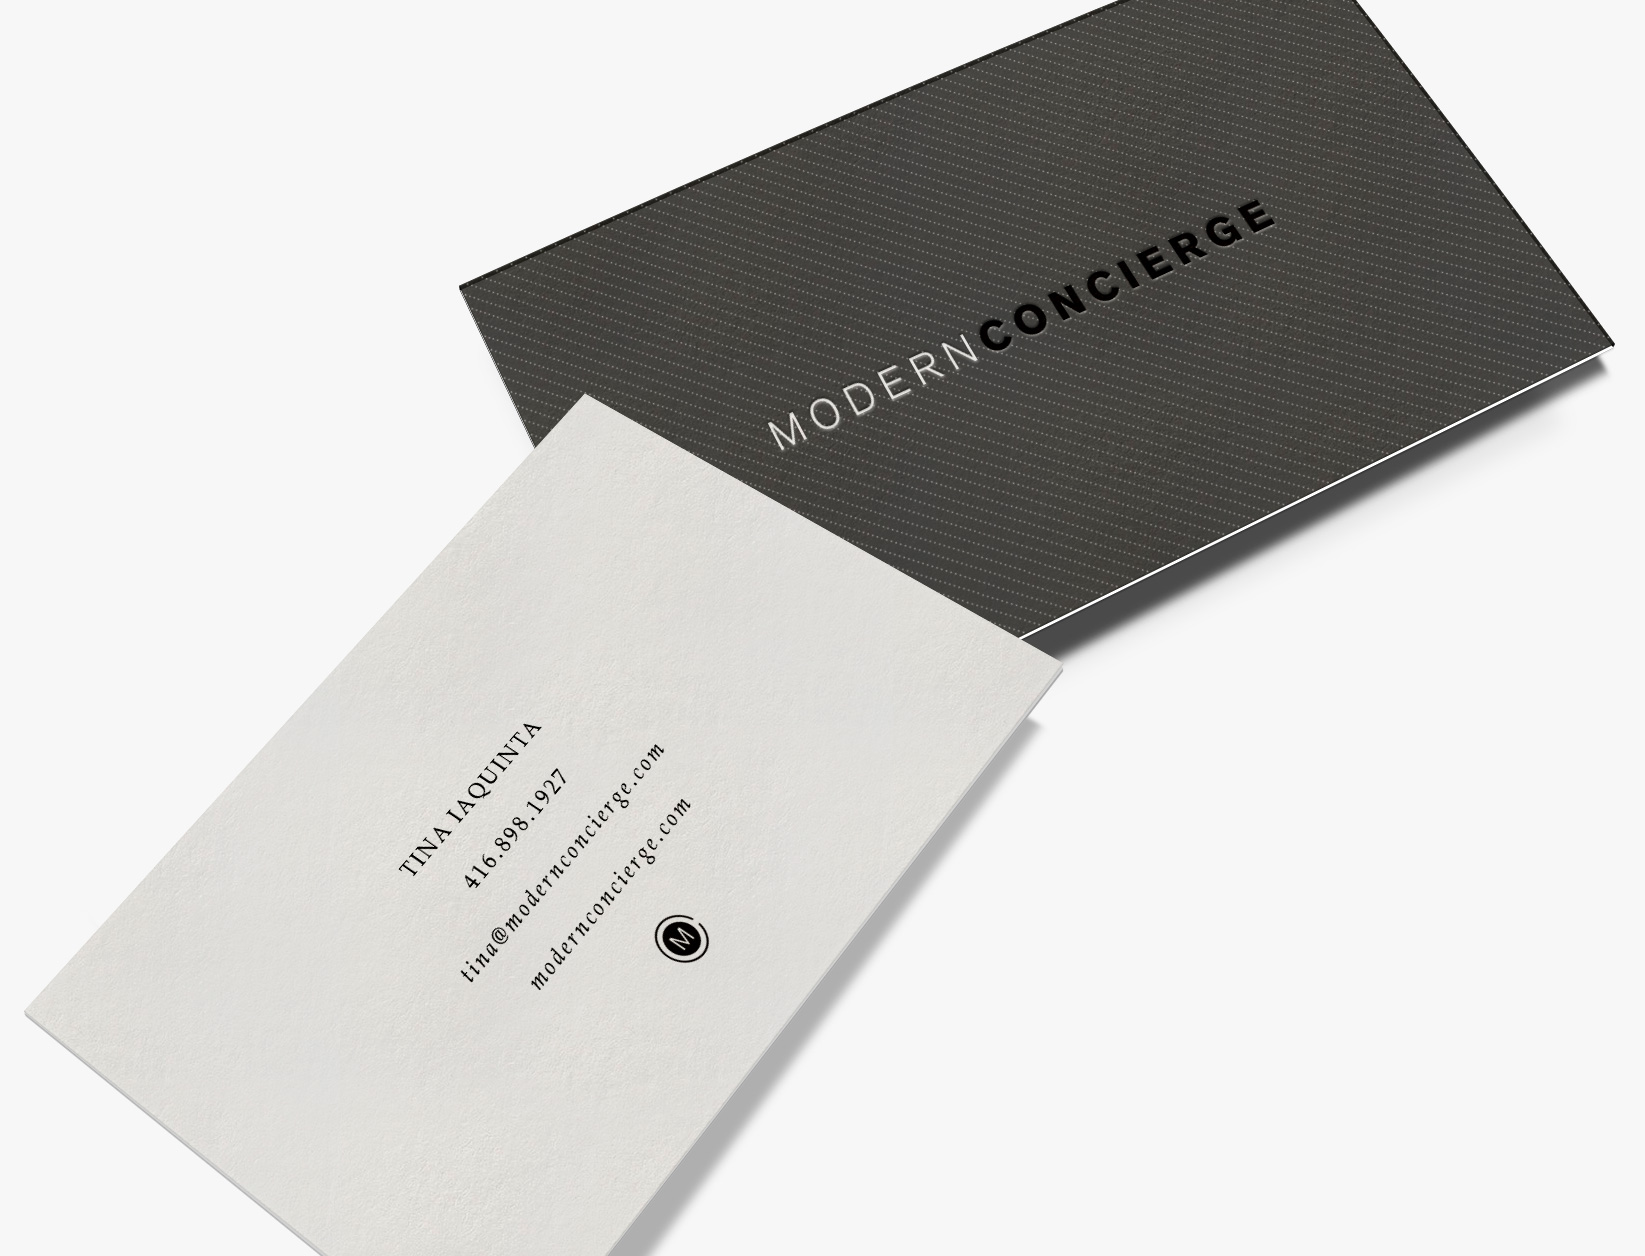 ModernConcierge_Mockup9.jpg